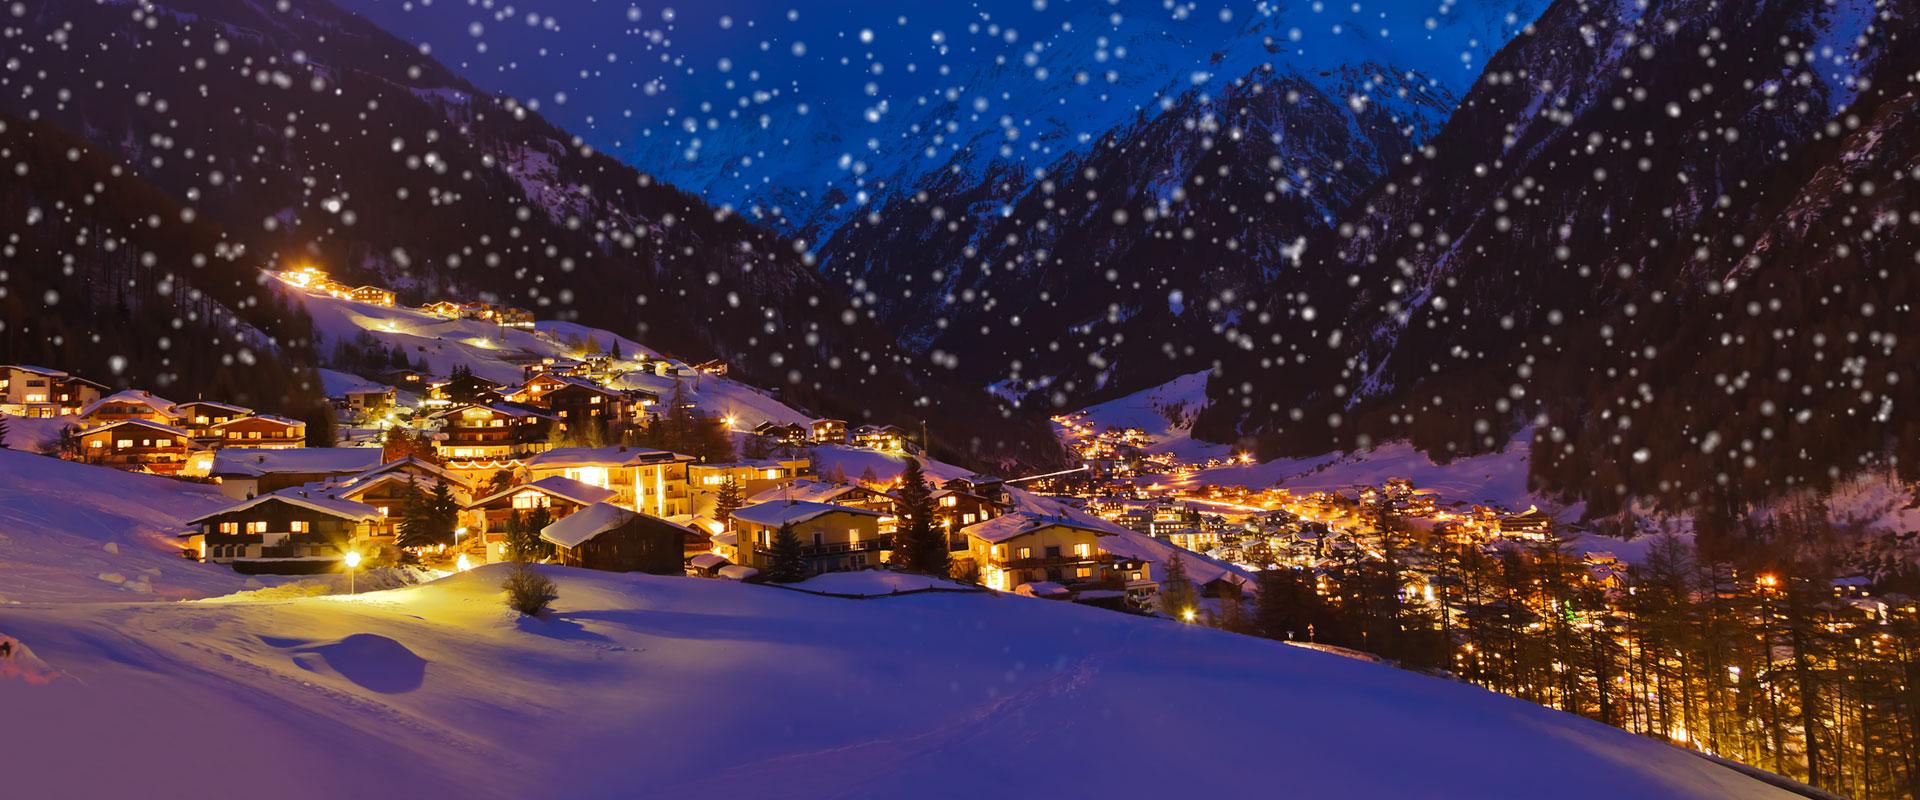 skiurlaub-tirol